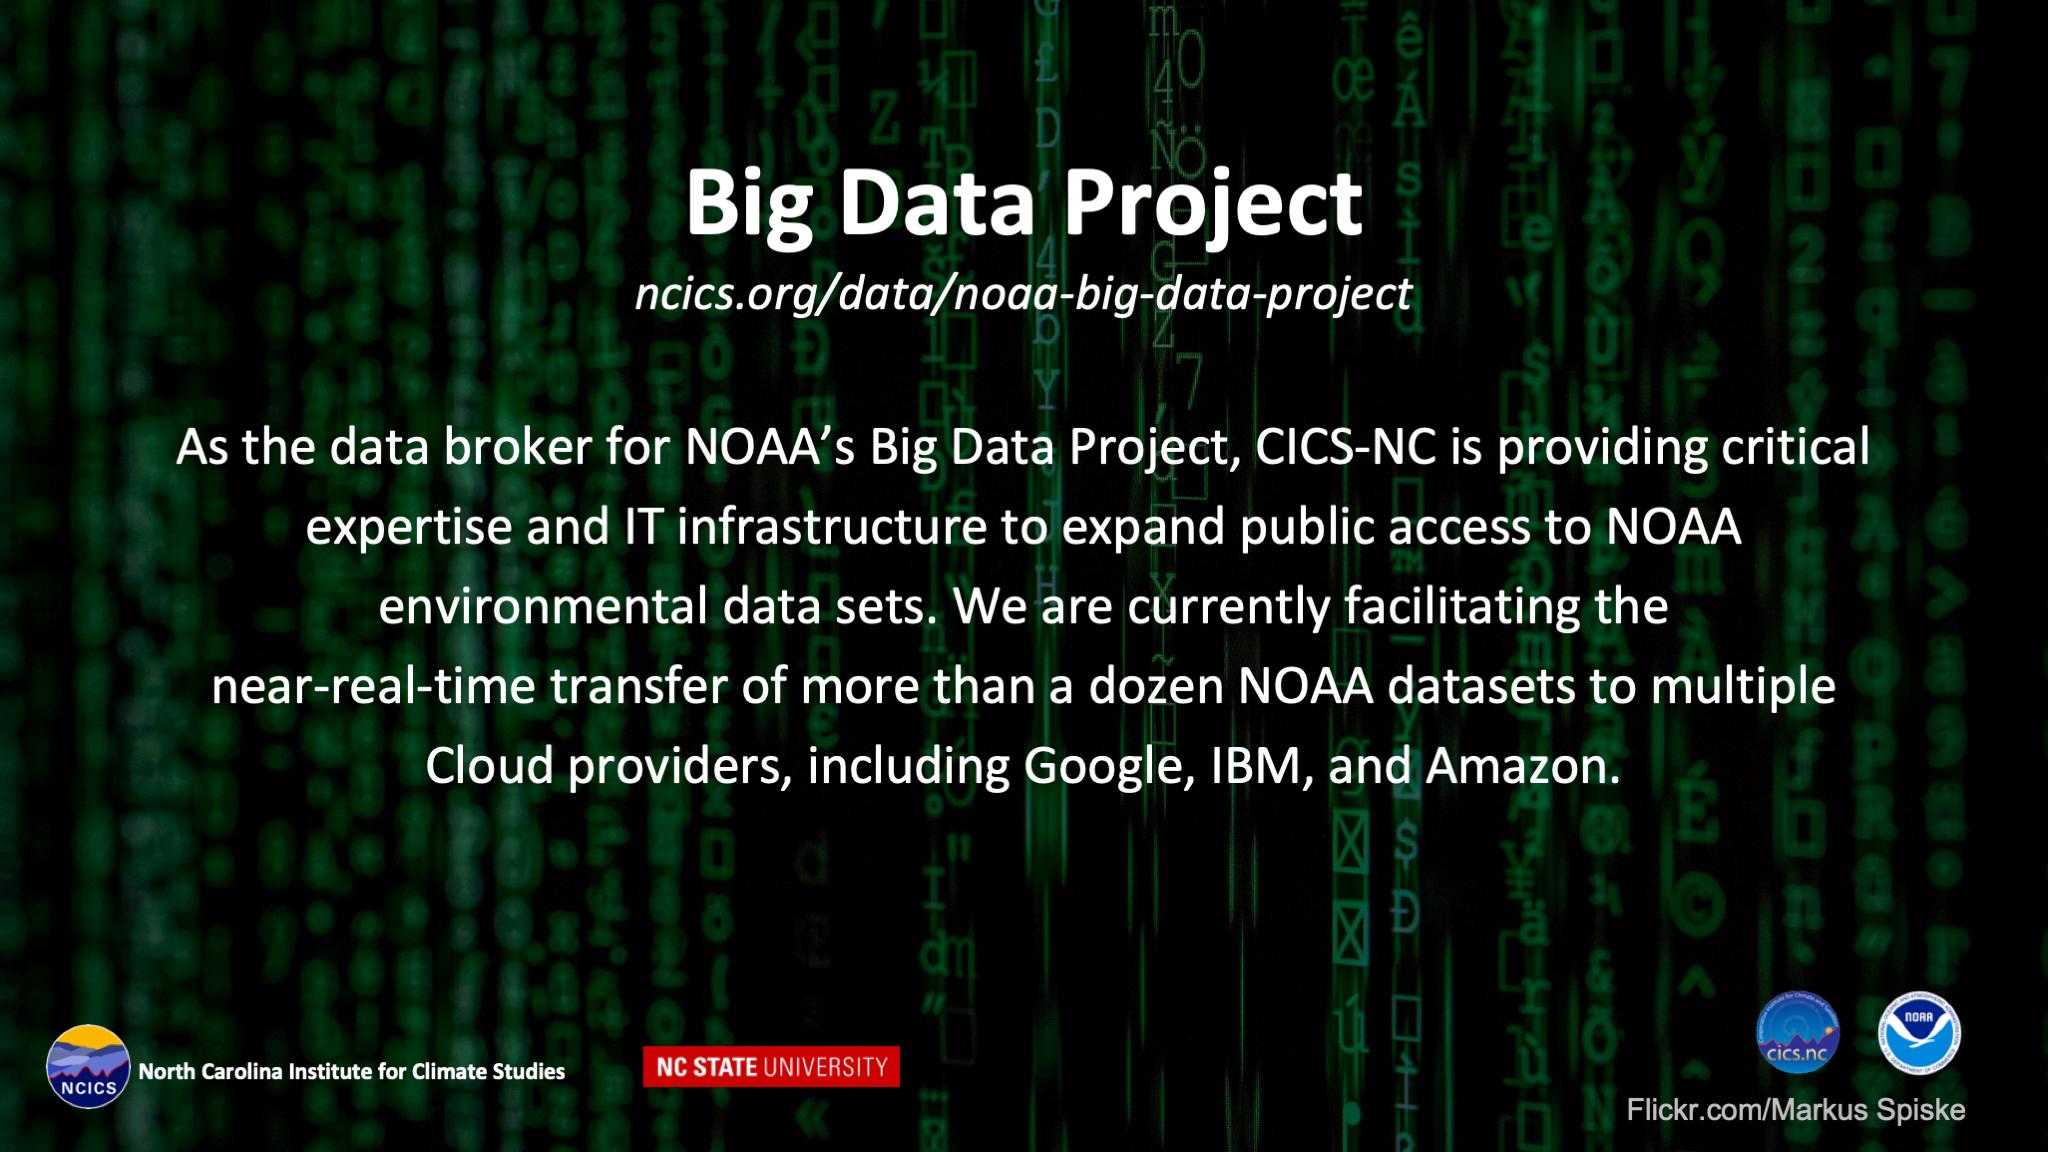 Big Data Project